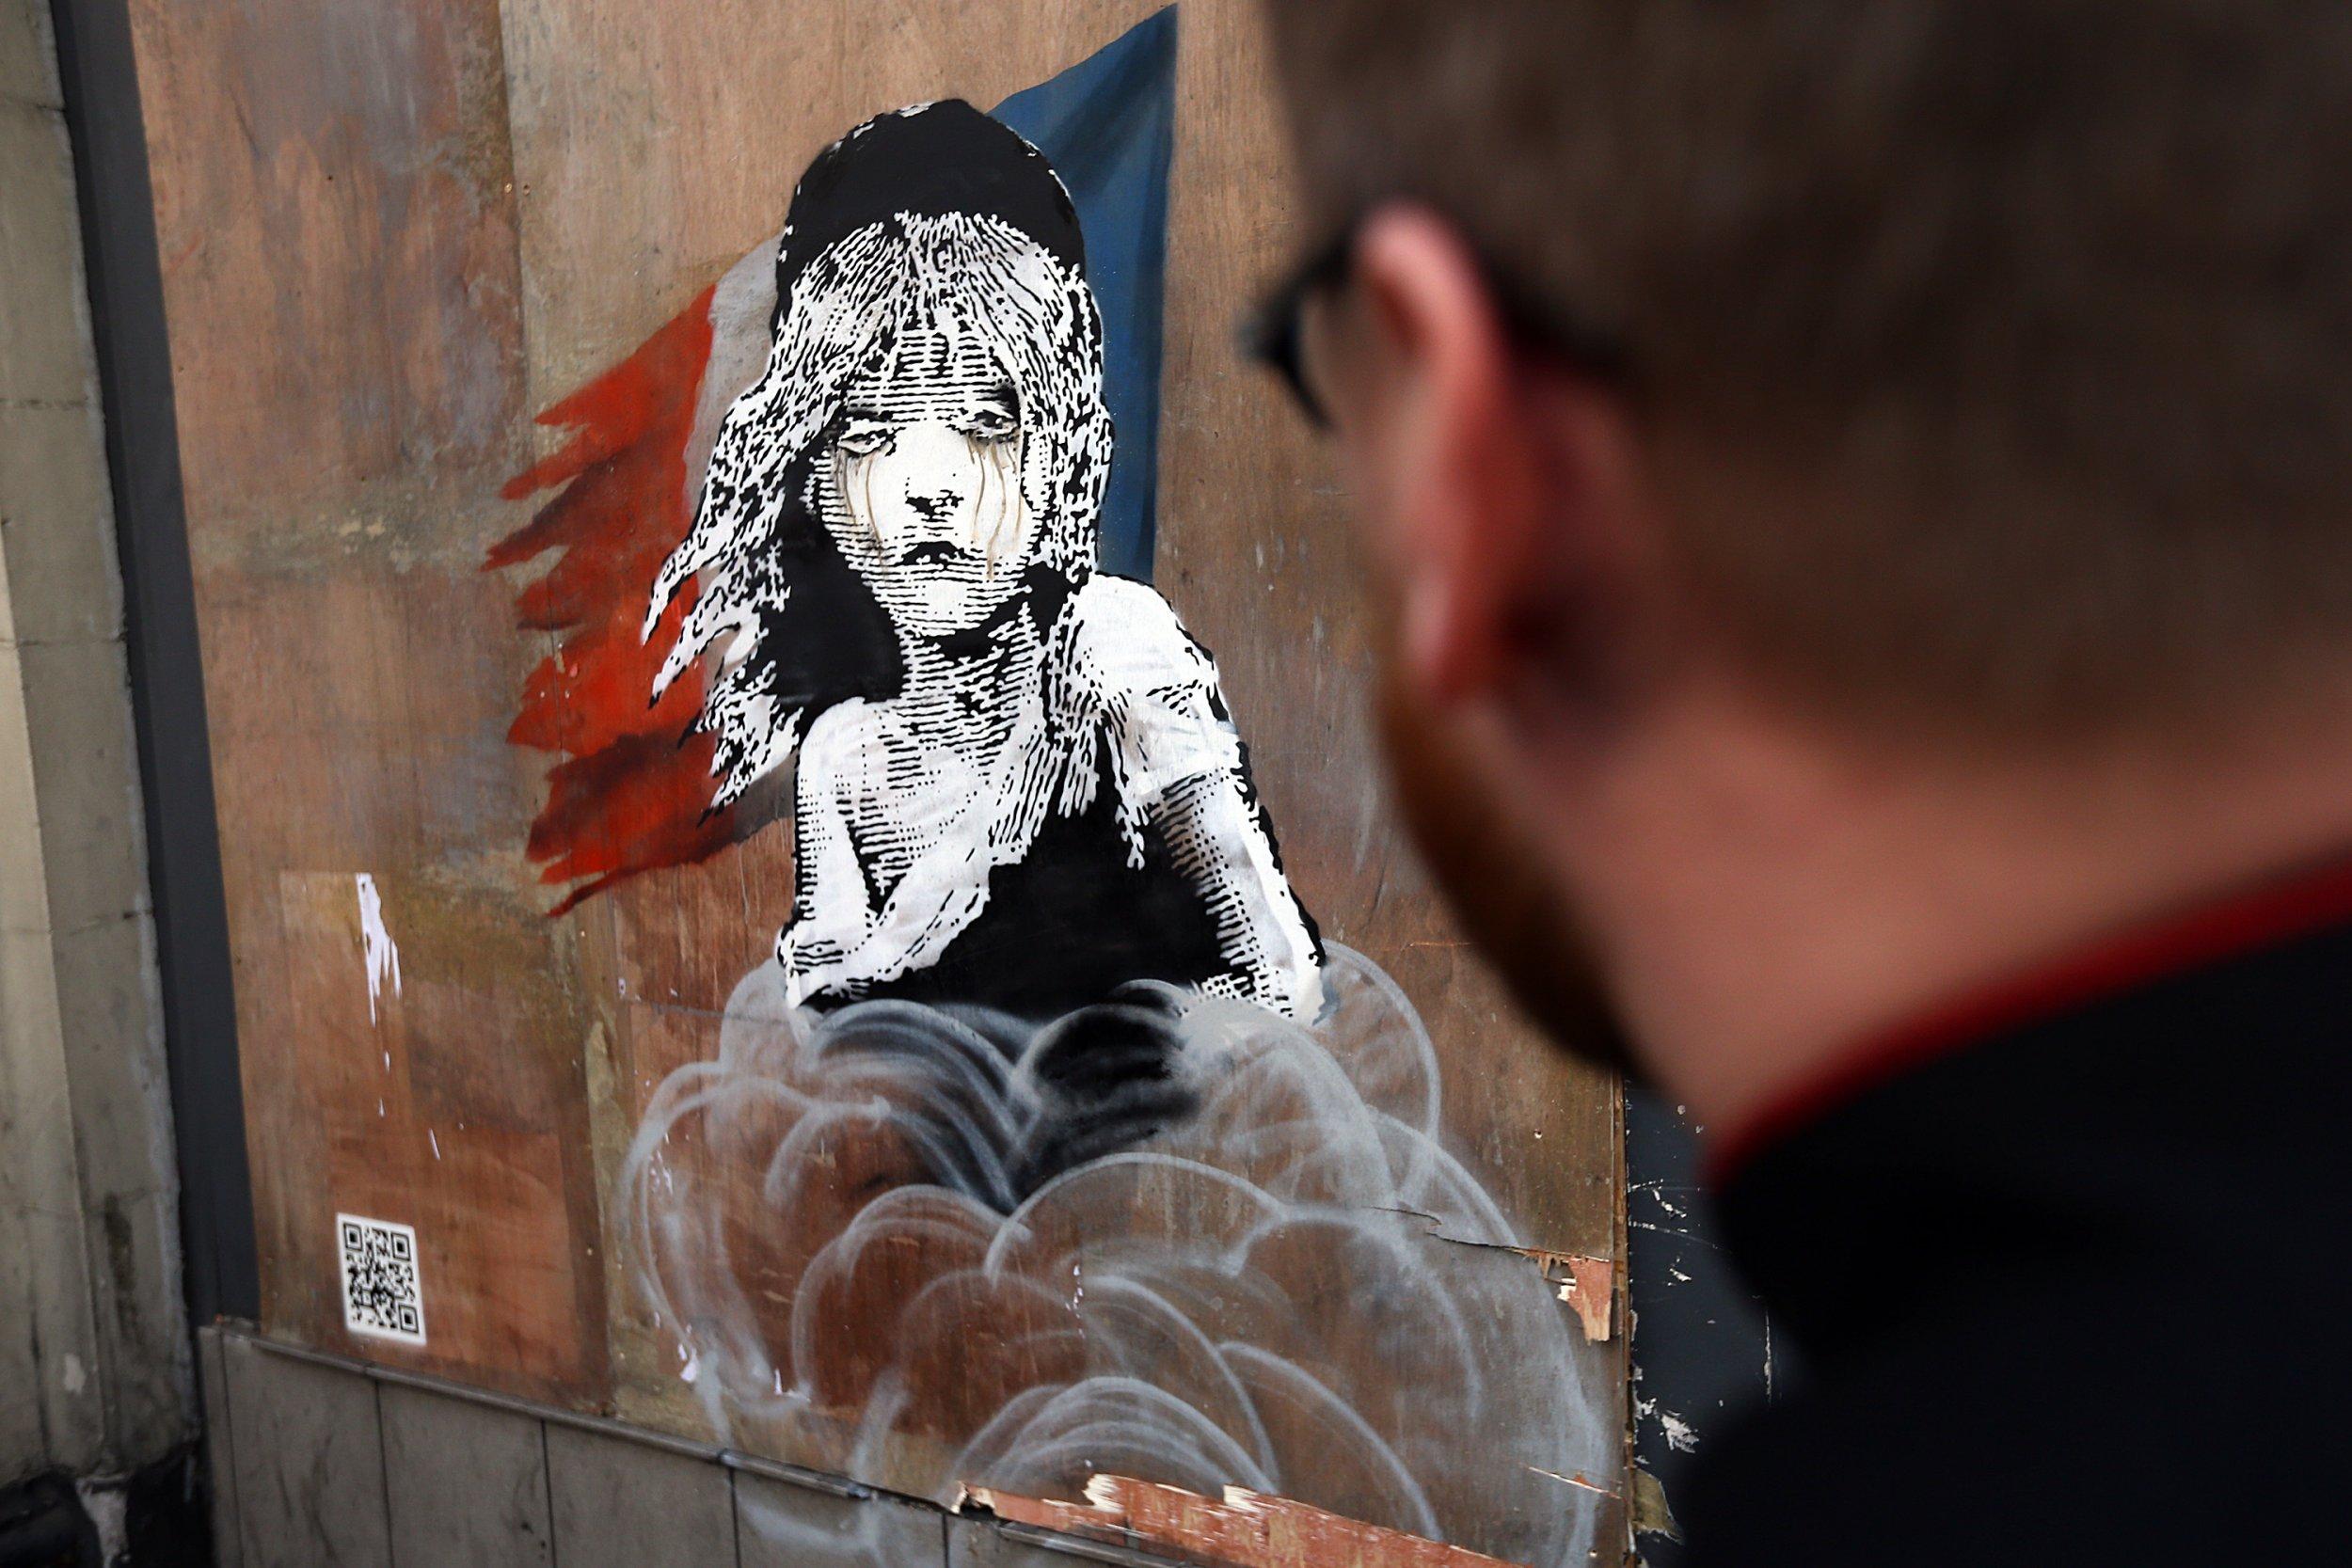 01_25_Banksy_Refugee_Mural_01